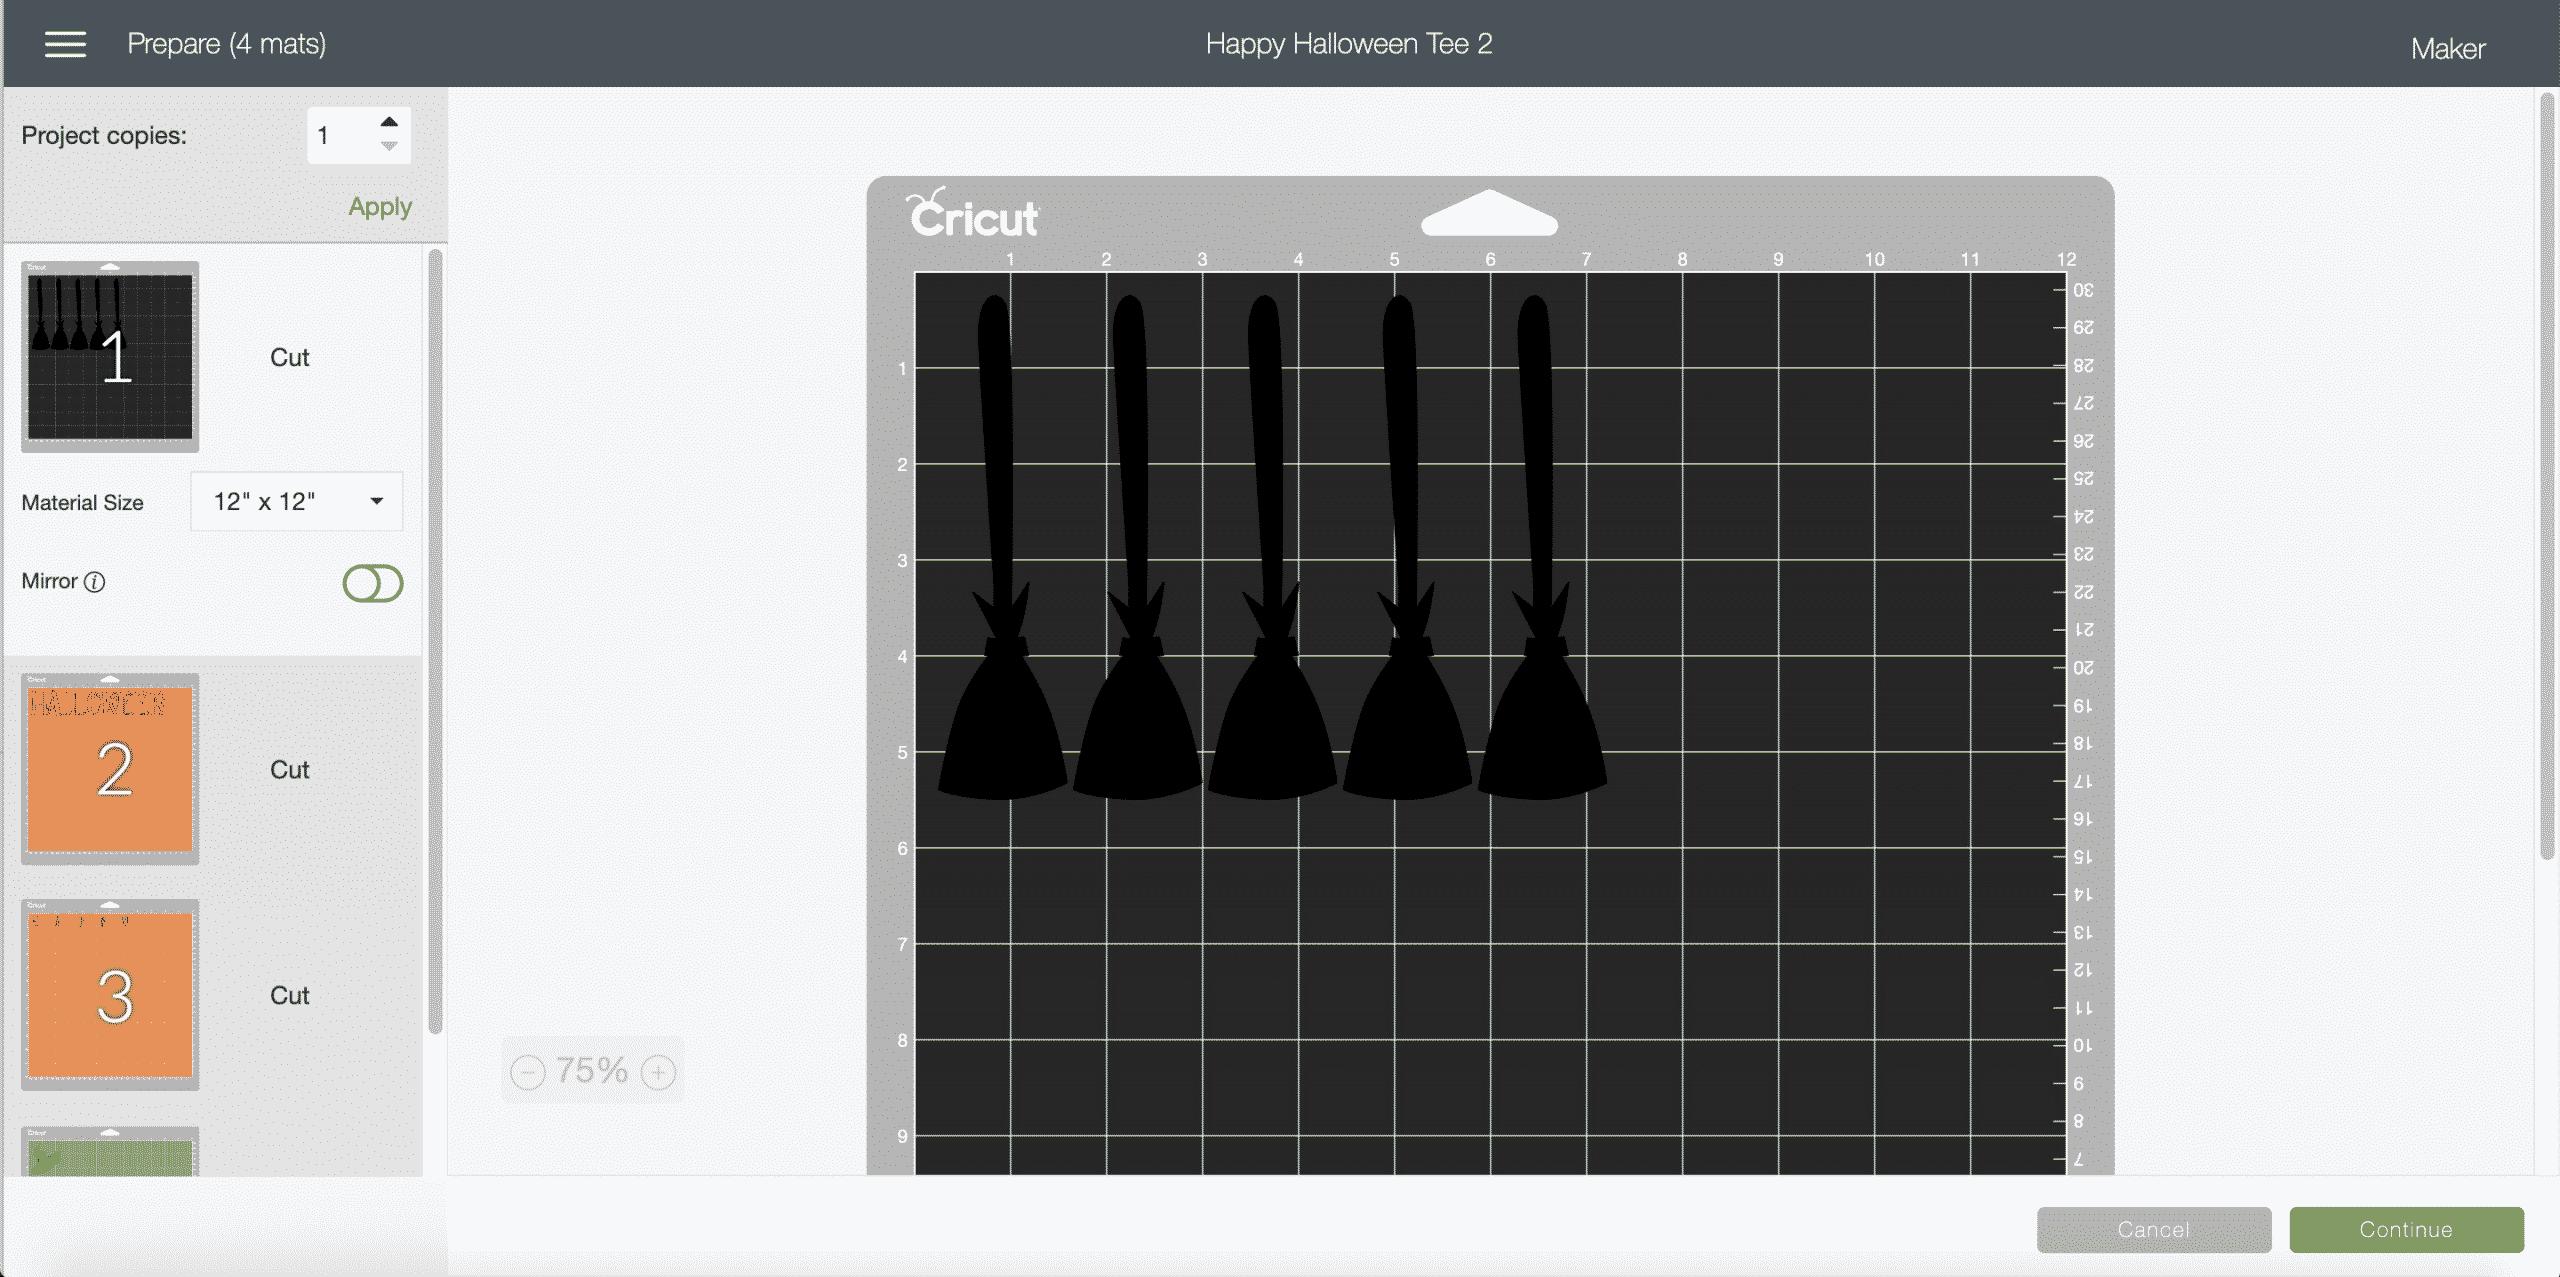 Layer 1 - Not Mirrored